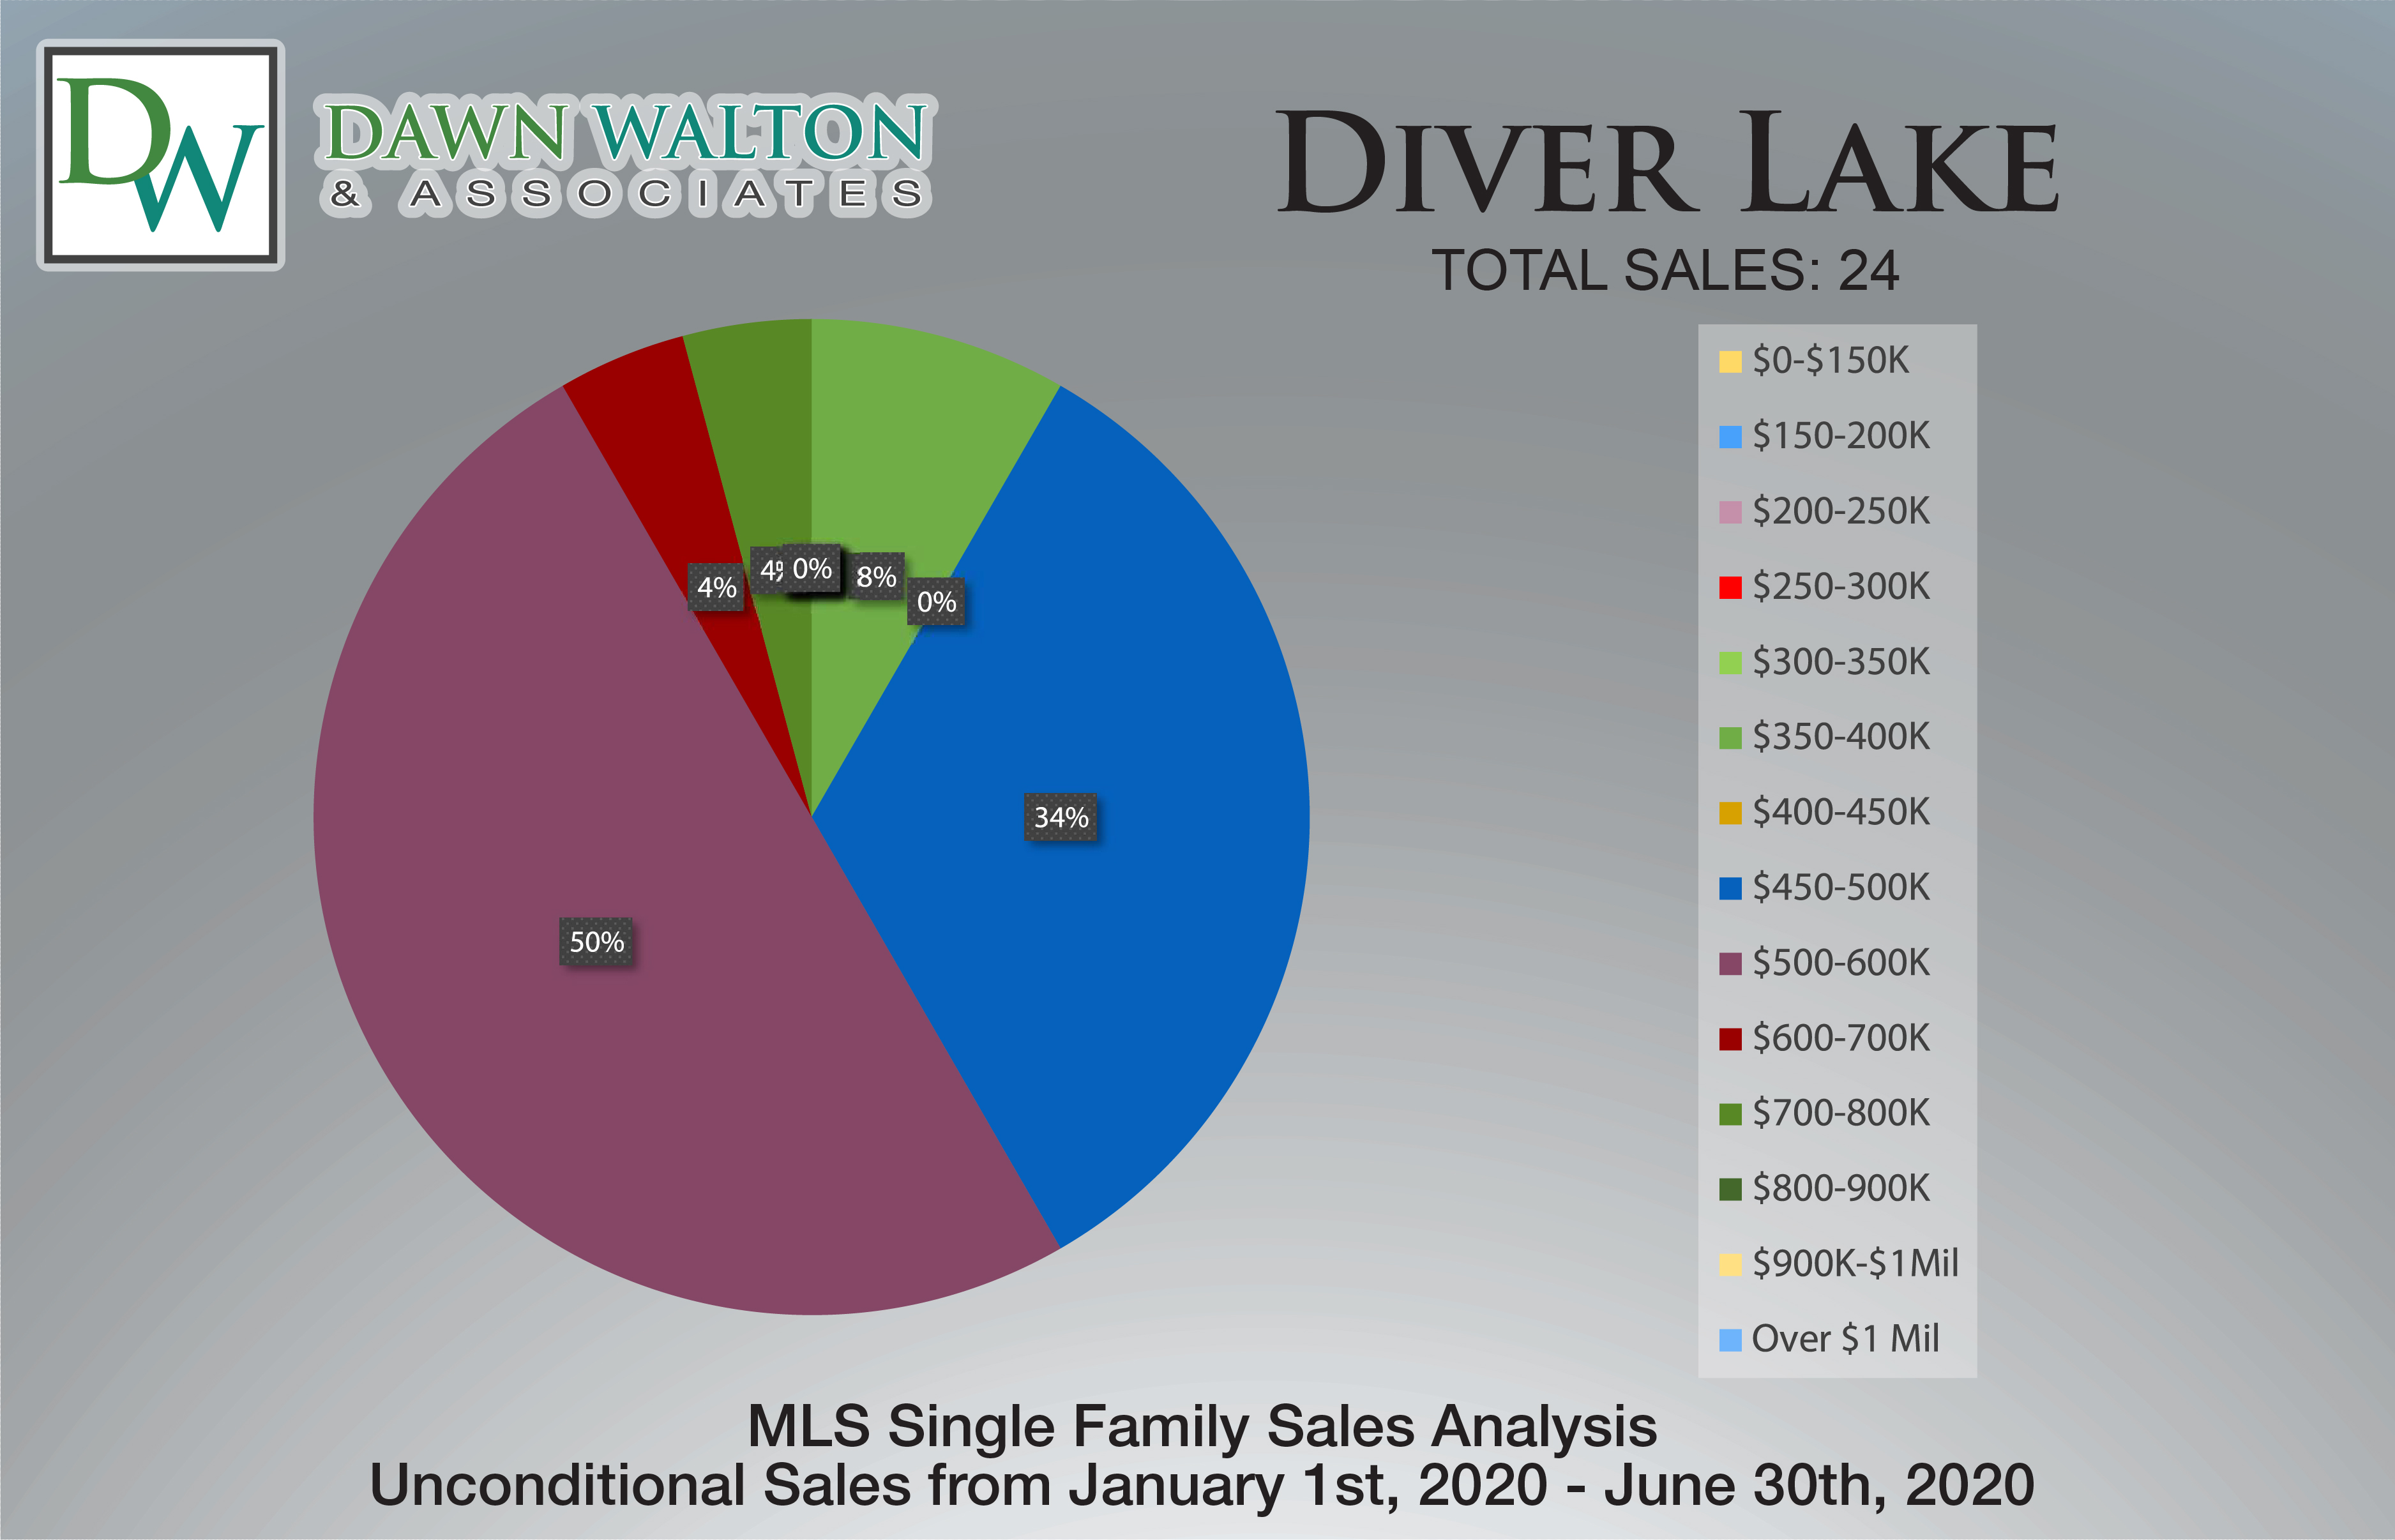 Diver Lake Real Estate Market Stats Price Percentage Jan 1- June 30th  2020 - Nanaimo Realtor Dawn Walton